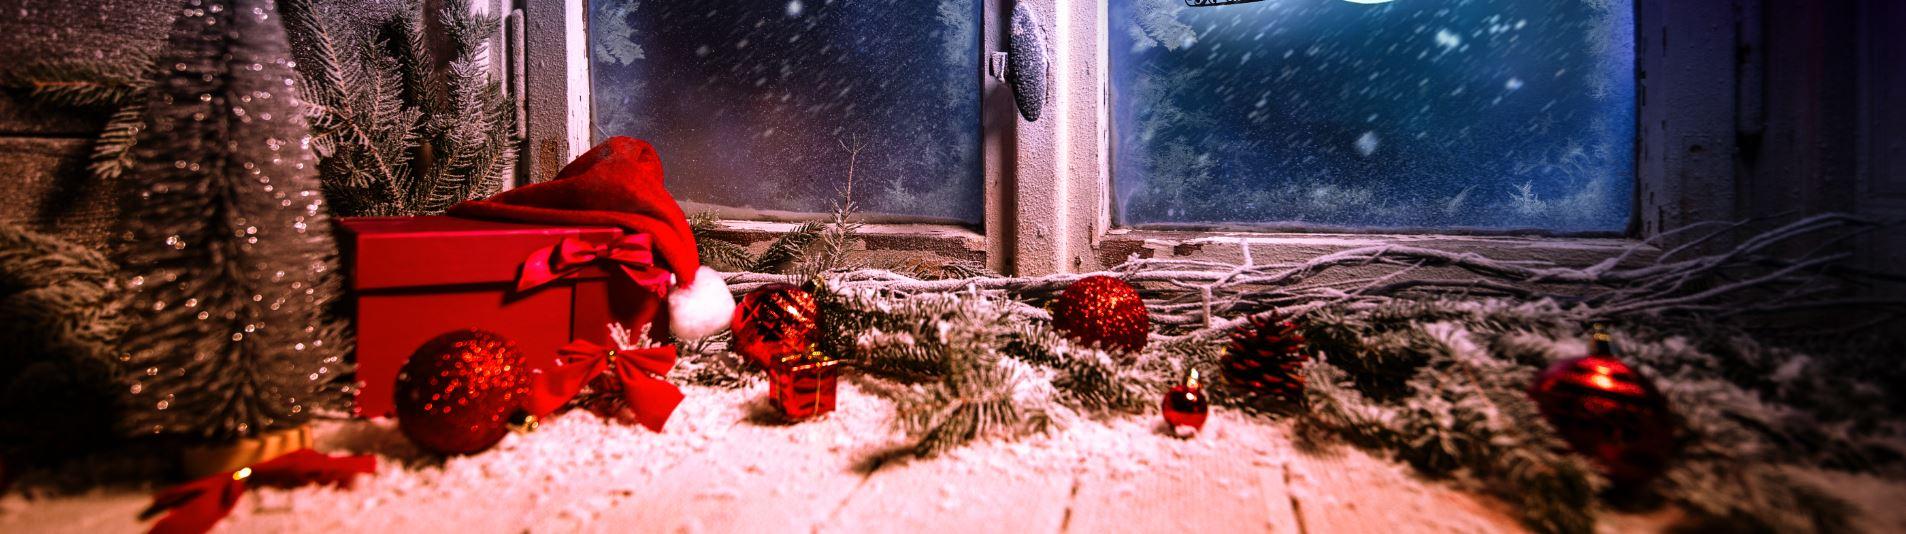 We Wish You a Merry Christmas List